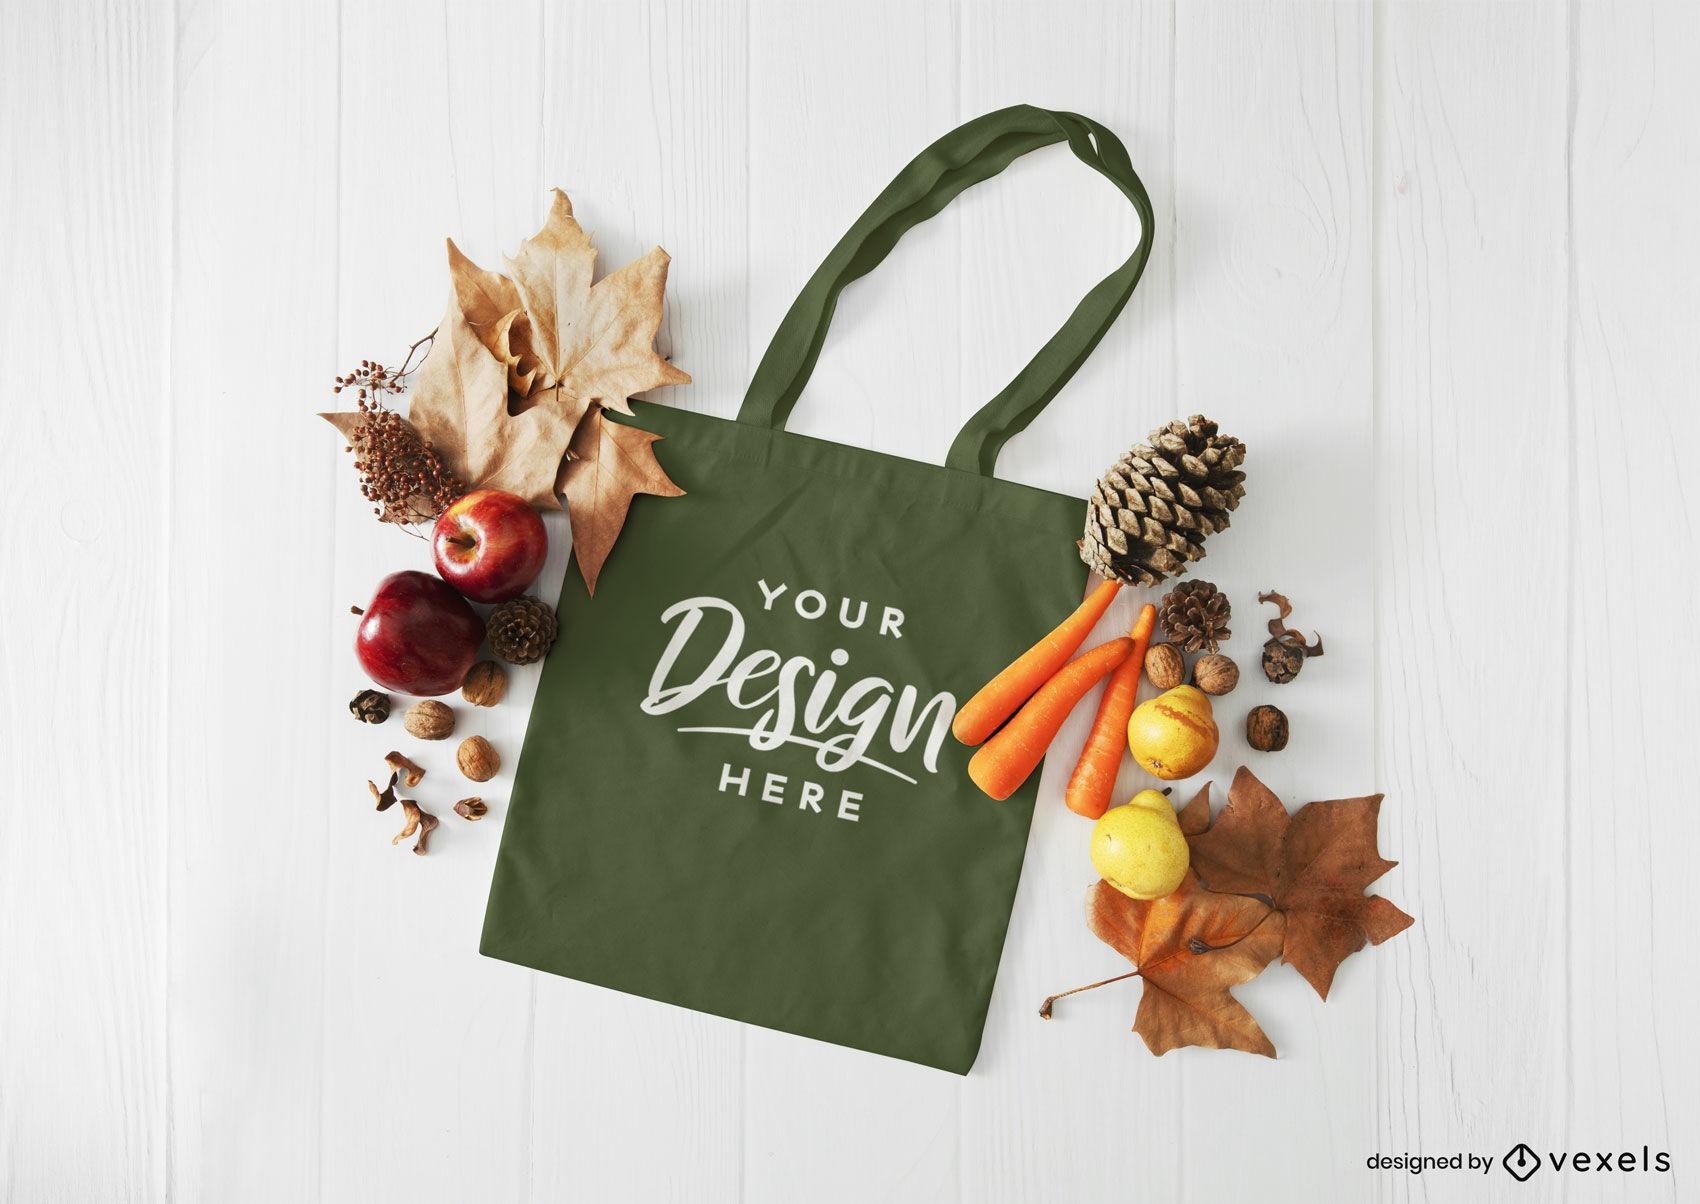 Maqueta de composición de otoño de bolso de mano verde